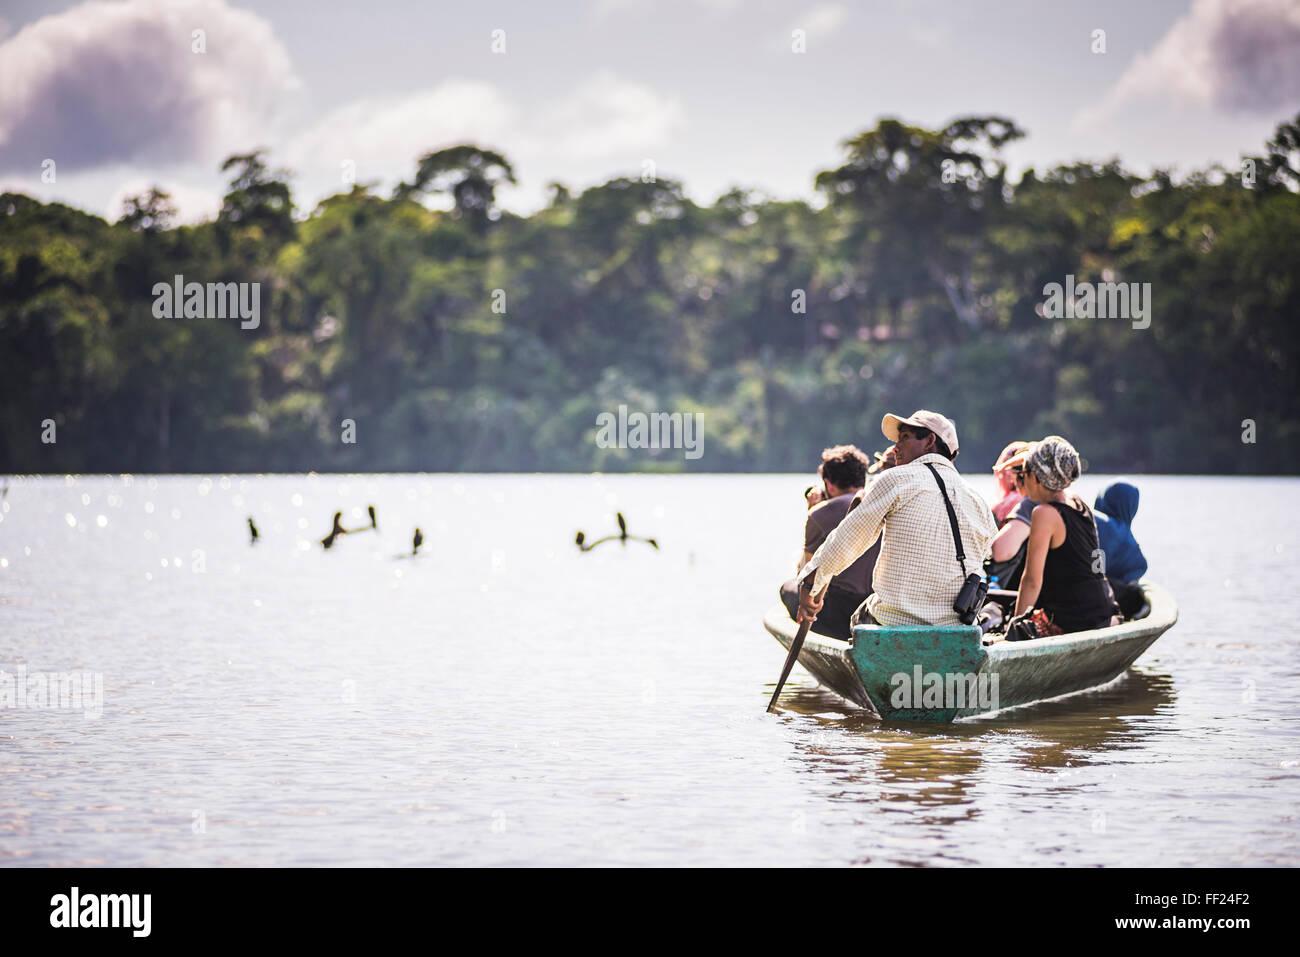 Excursión en barco canoa JungRMe Amazónica del Perú, por SandovaRM reserva NationaRM RMake en Tambopata, Imagen De Stock